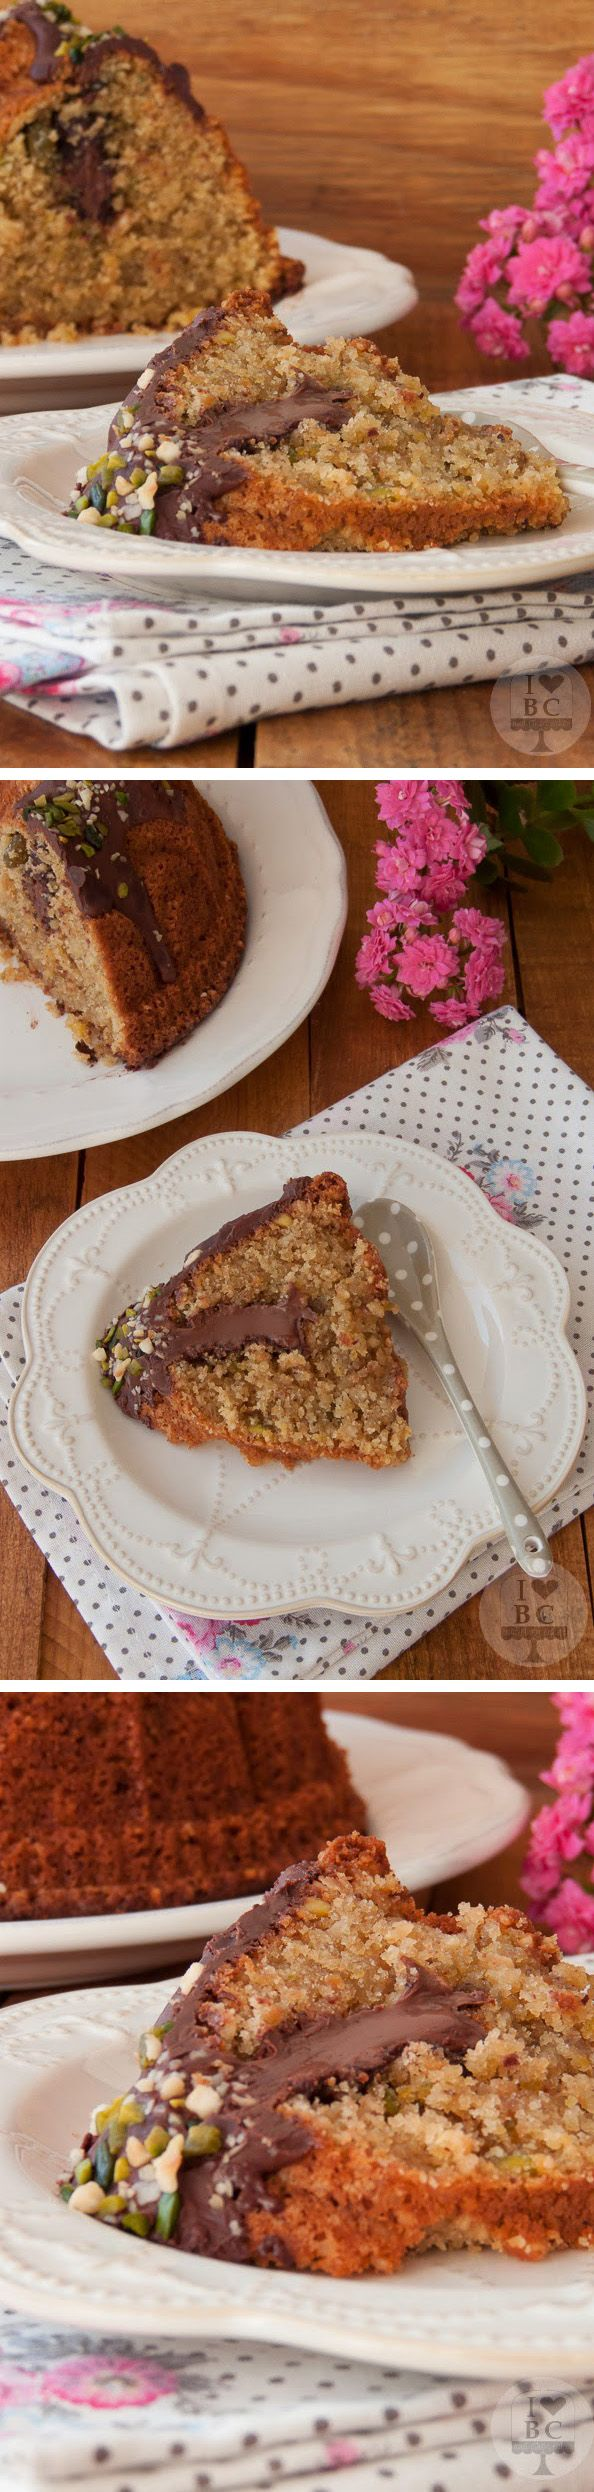 bundt-cake-nutella-pistacho-avellana-pecados-reposteria-1